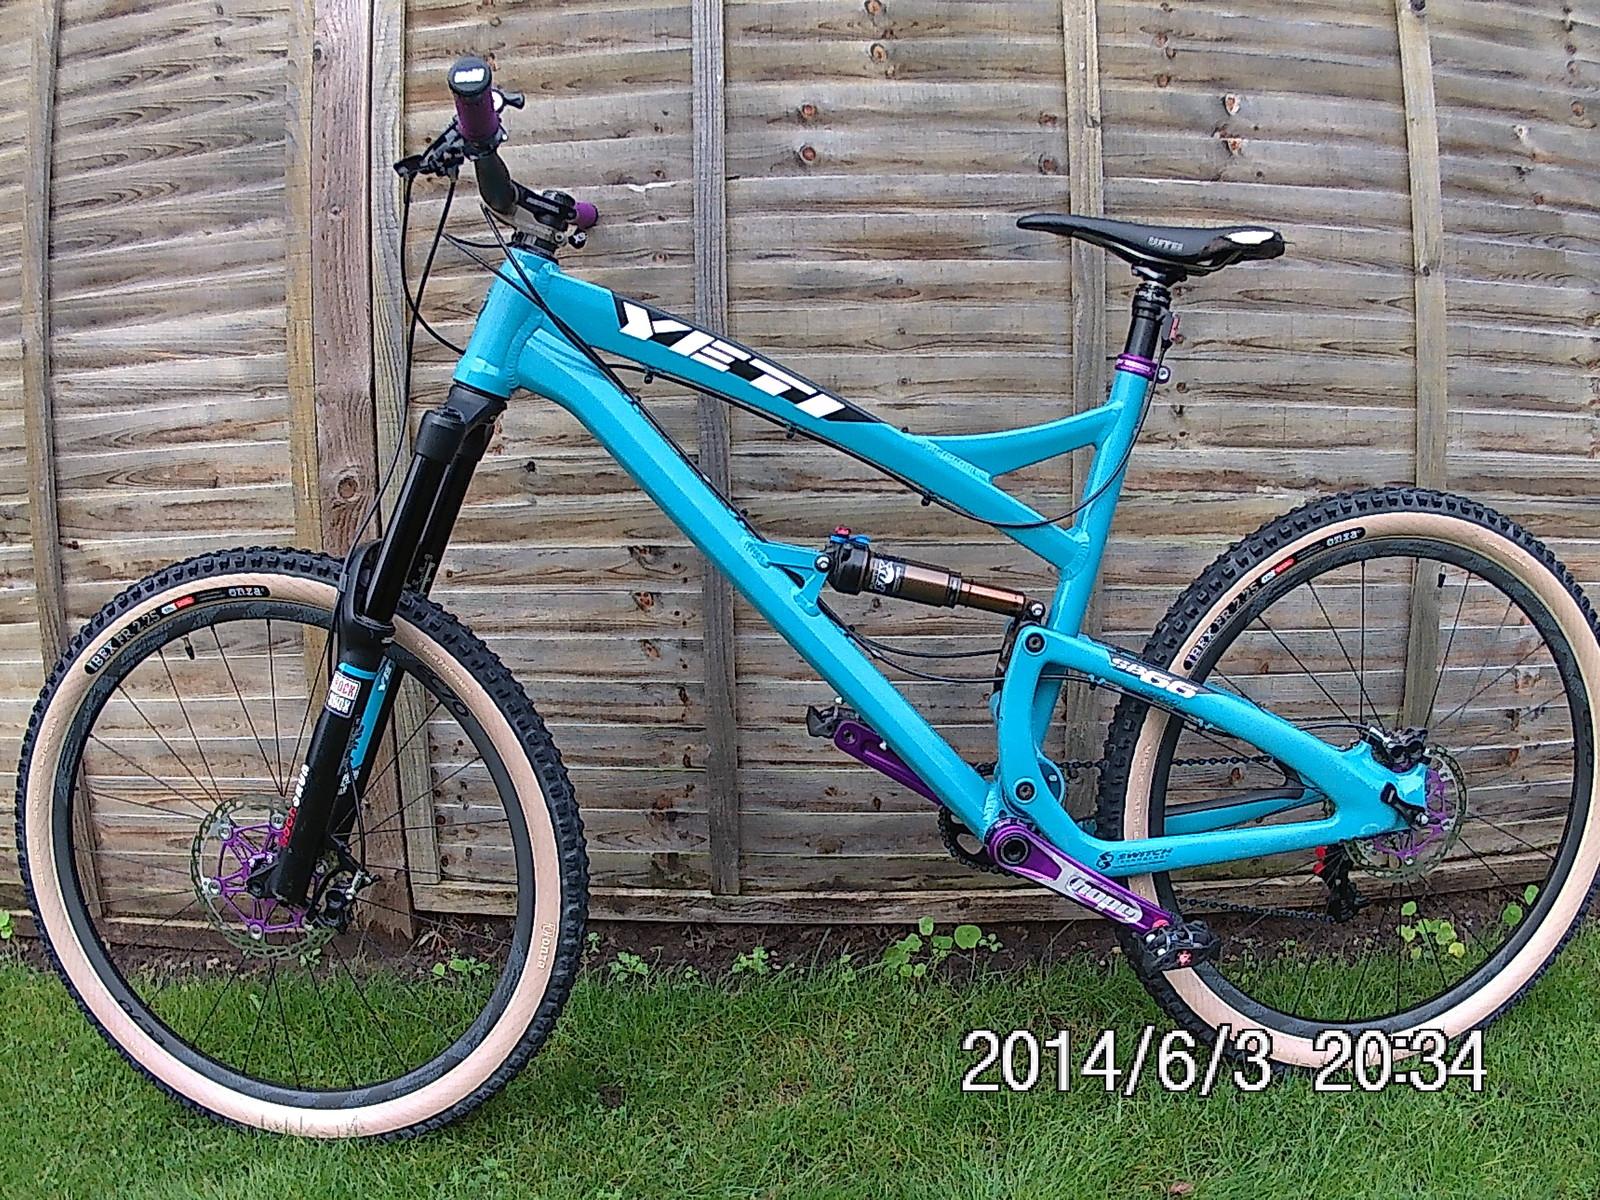 20140603 203453 - Bítel - Mountain Biking Pictures - Vital MTB